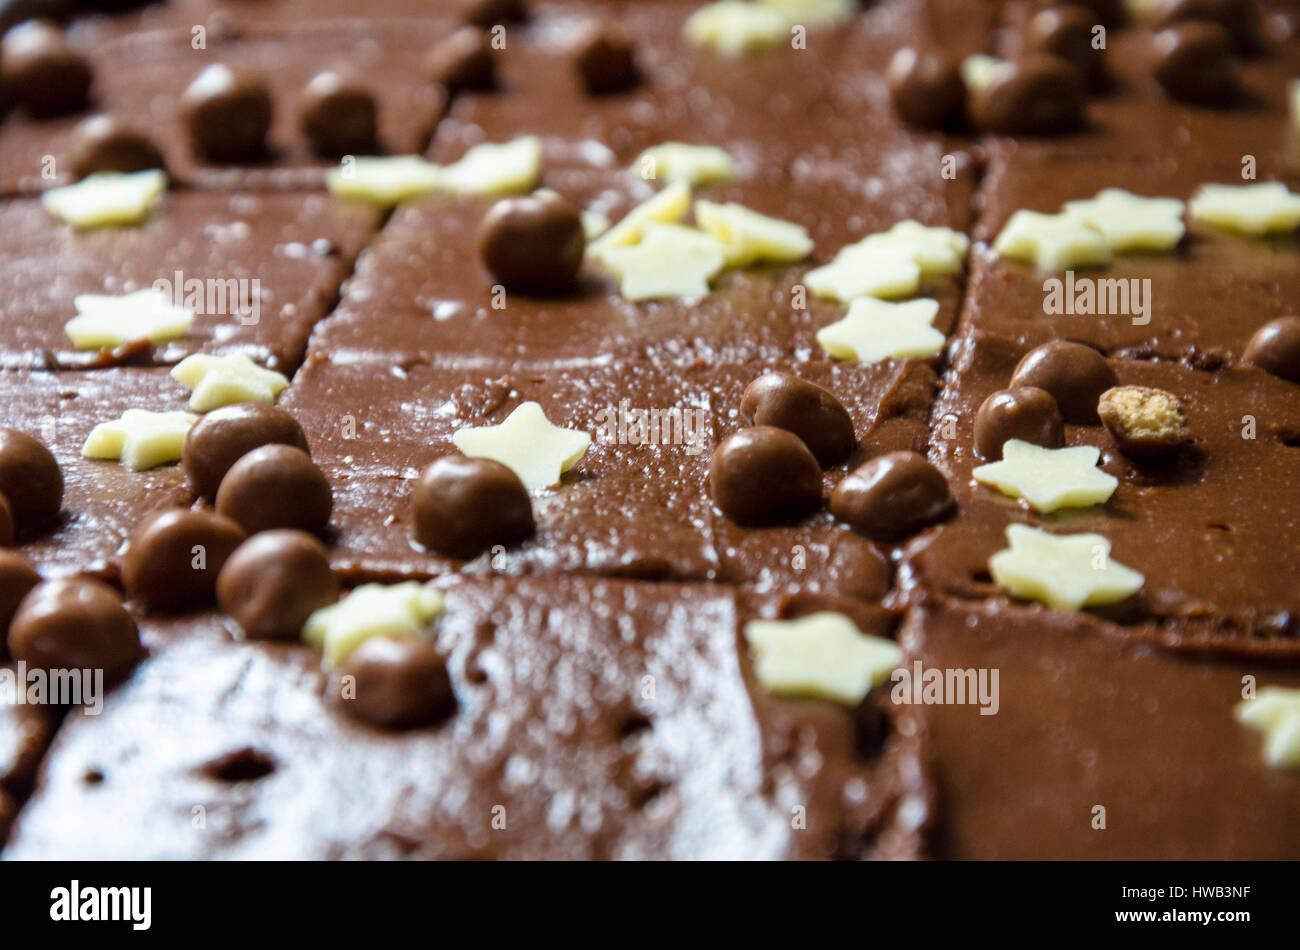 A shop bought chocolate tray bake cake. Stock Photo